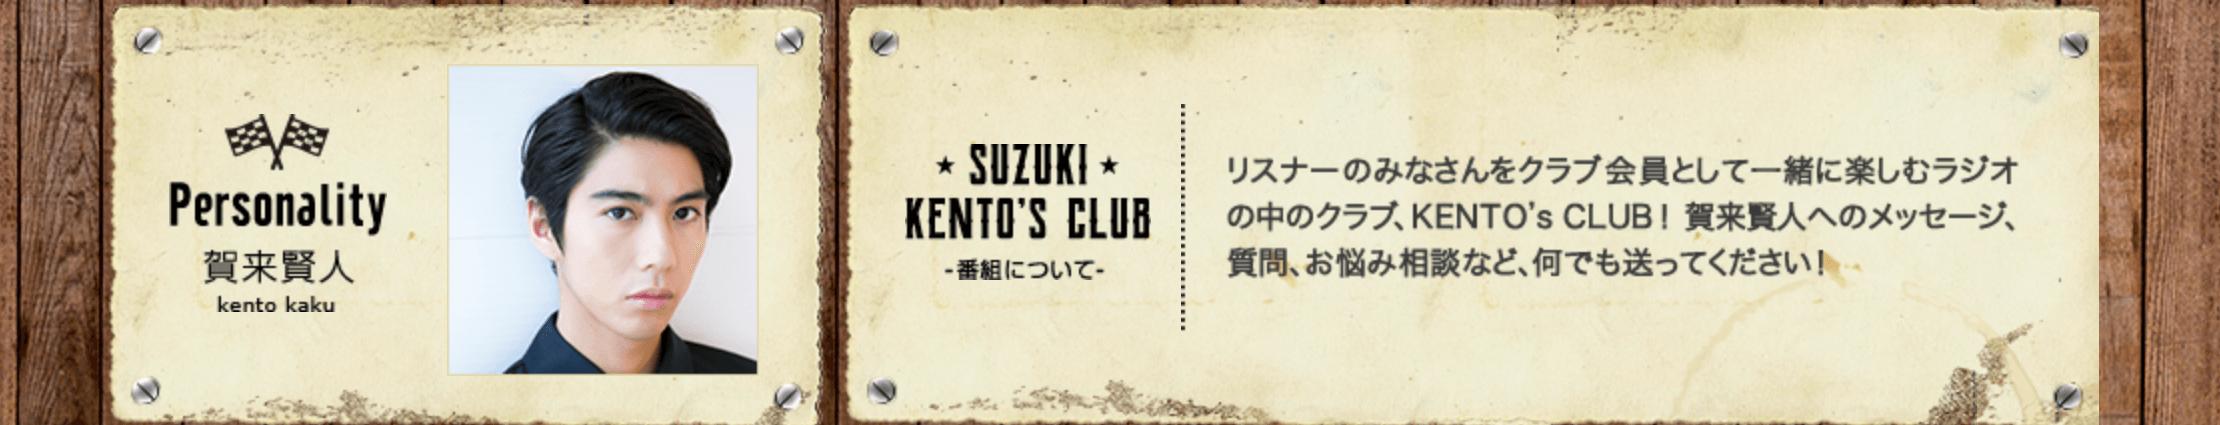 KENTOS CLUB